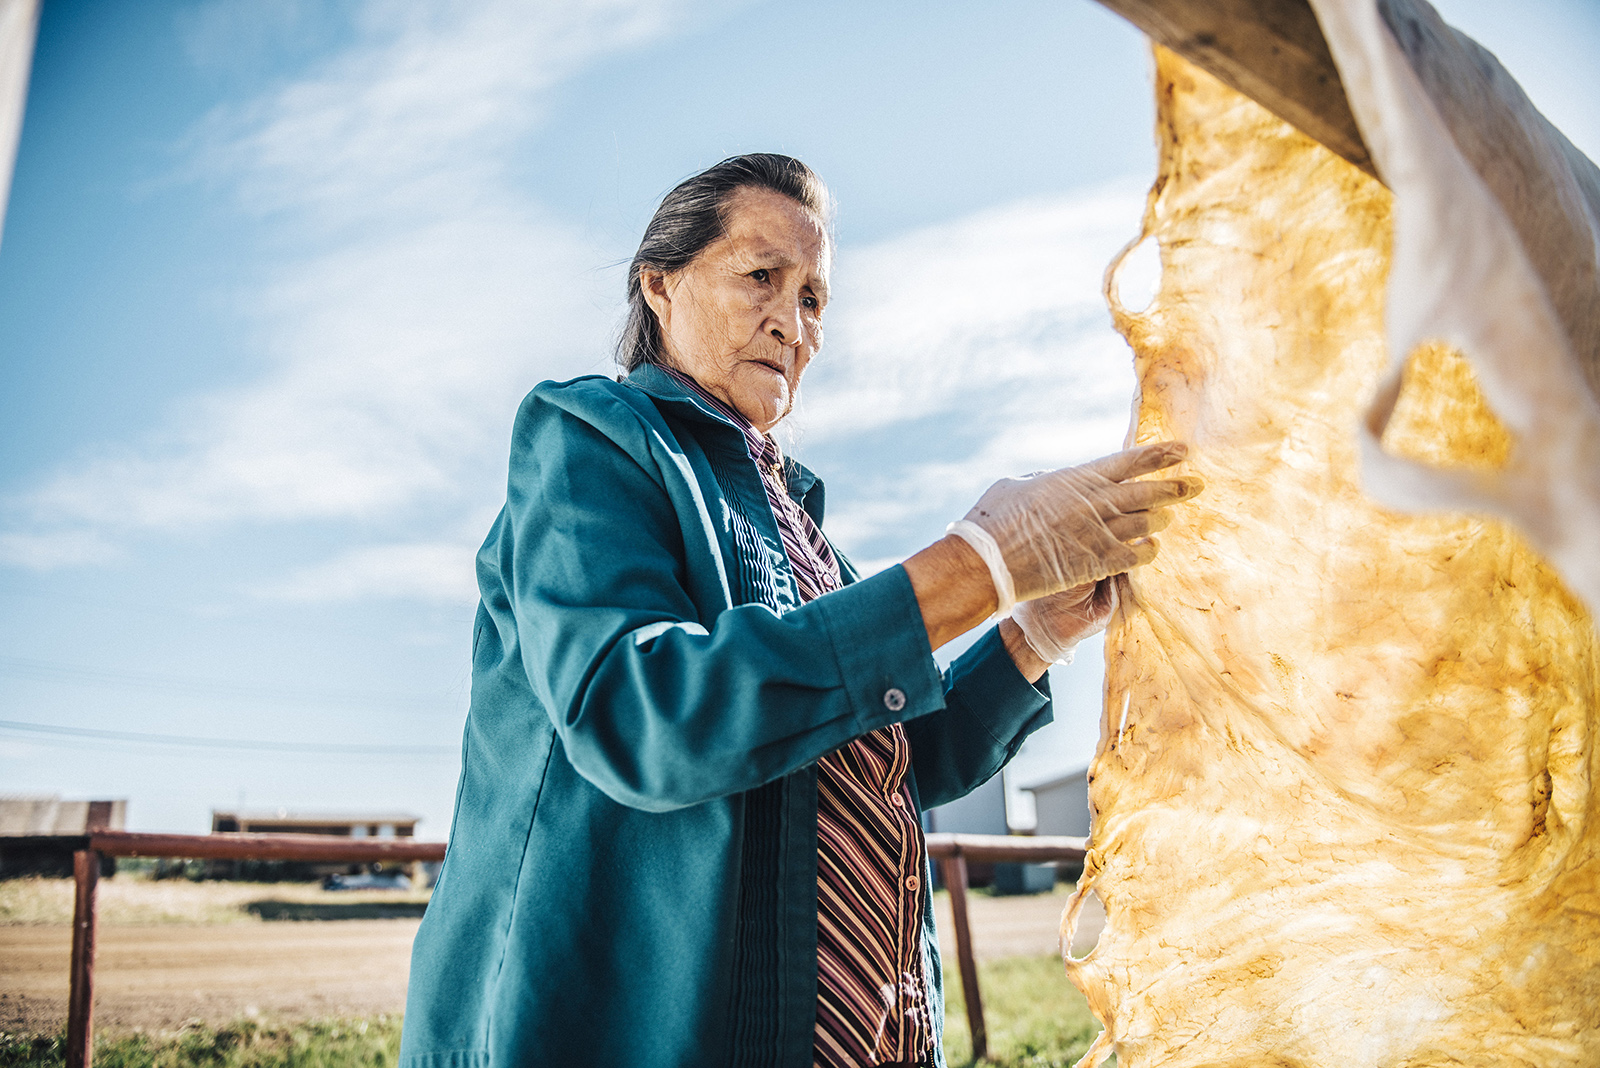 Stella Mackeinzo, a Déine artist, hangs up a moose hide to dry